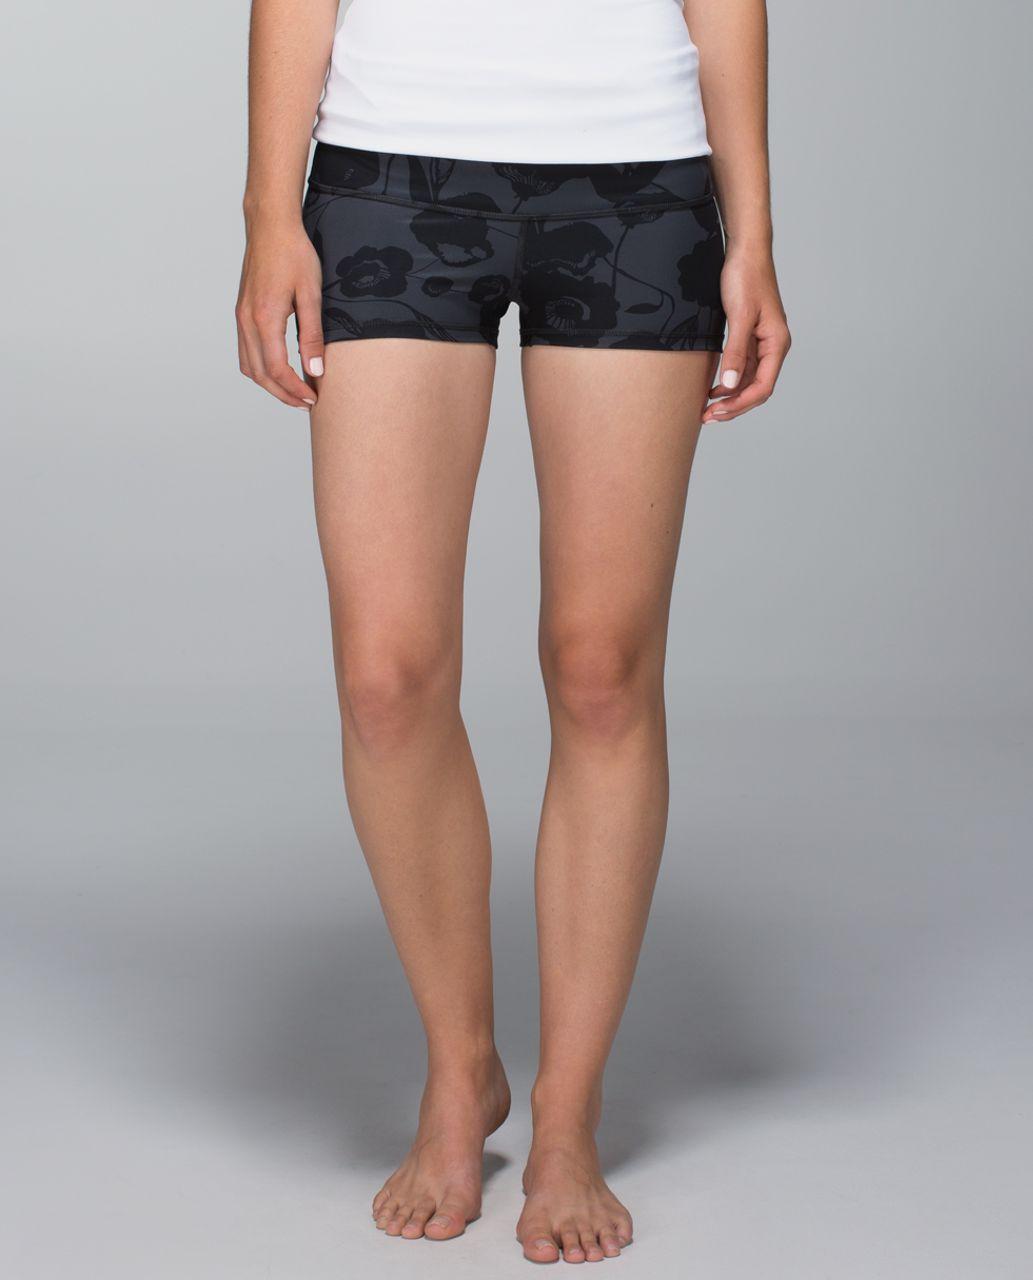 Lululemon Boogie Short *Full-On Luxtreme (Print) - Flat Inky Floral Printed Black Deep Coal / Black